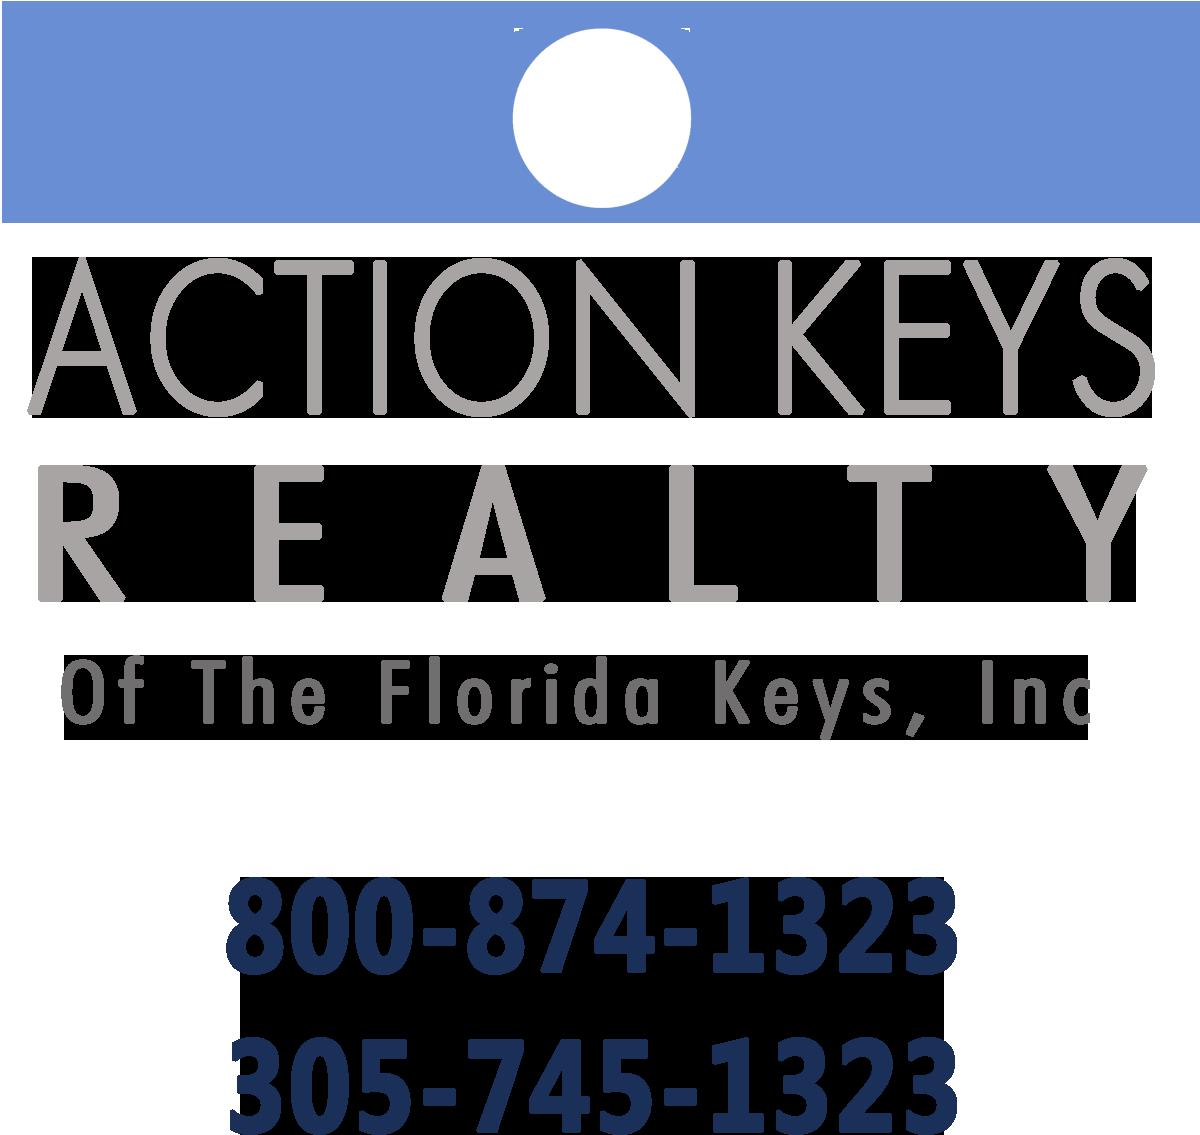 Action Keys Realty of the Florida Keys